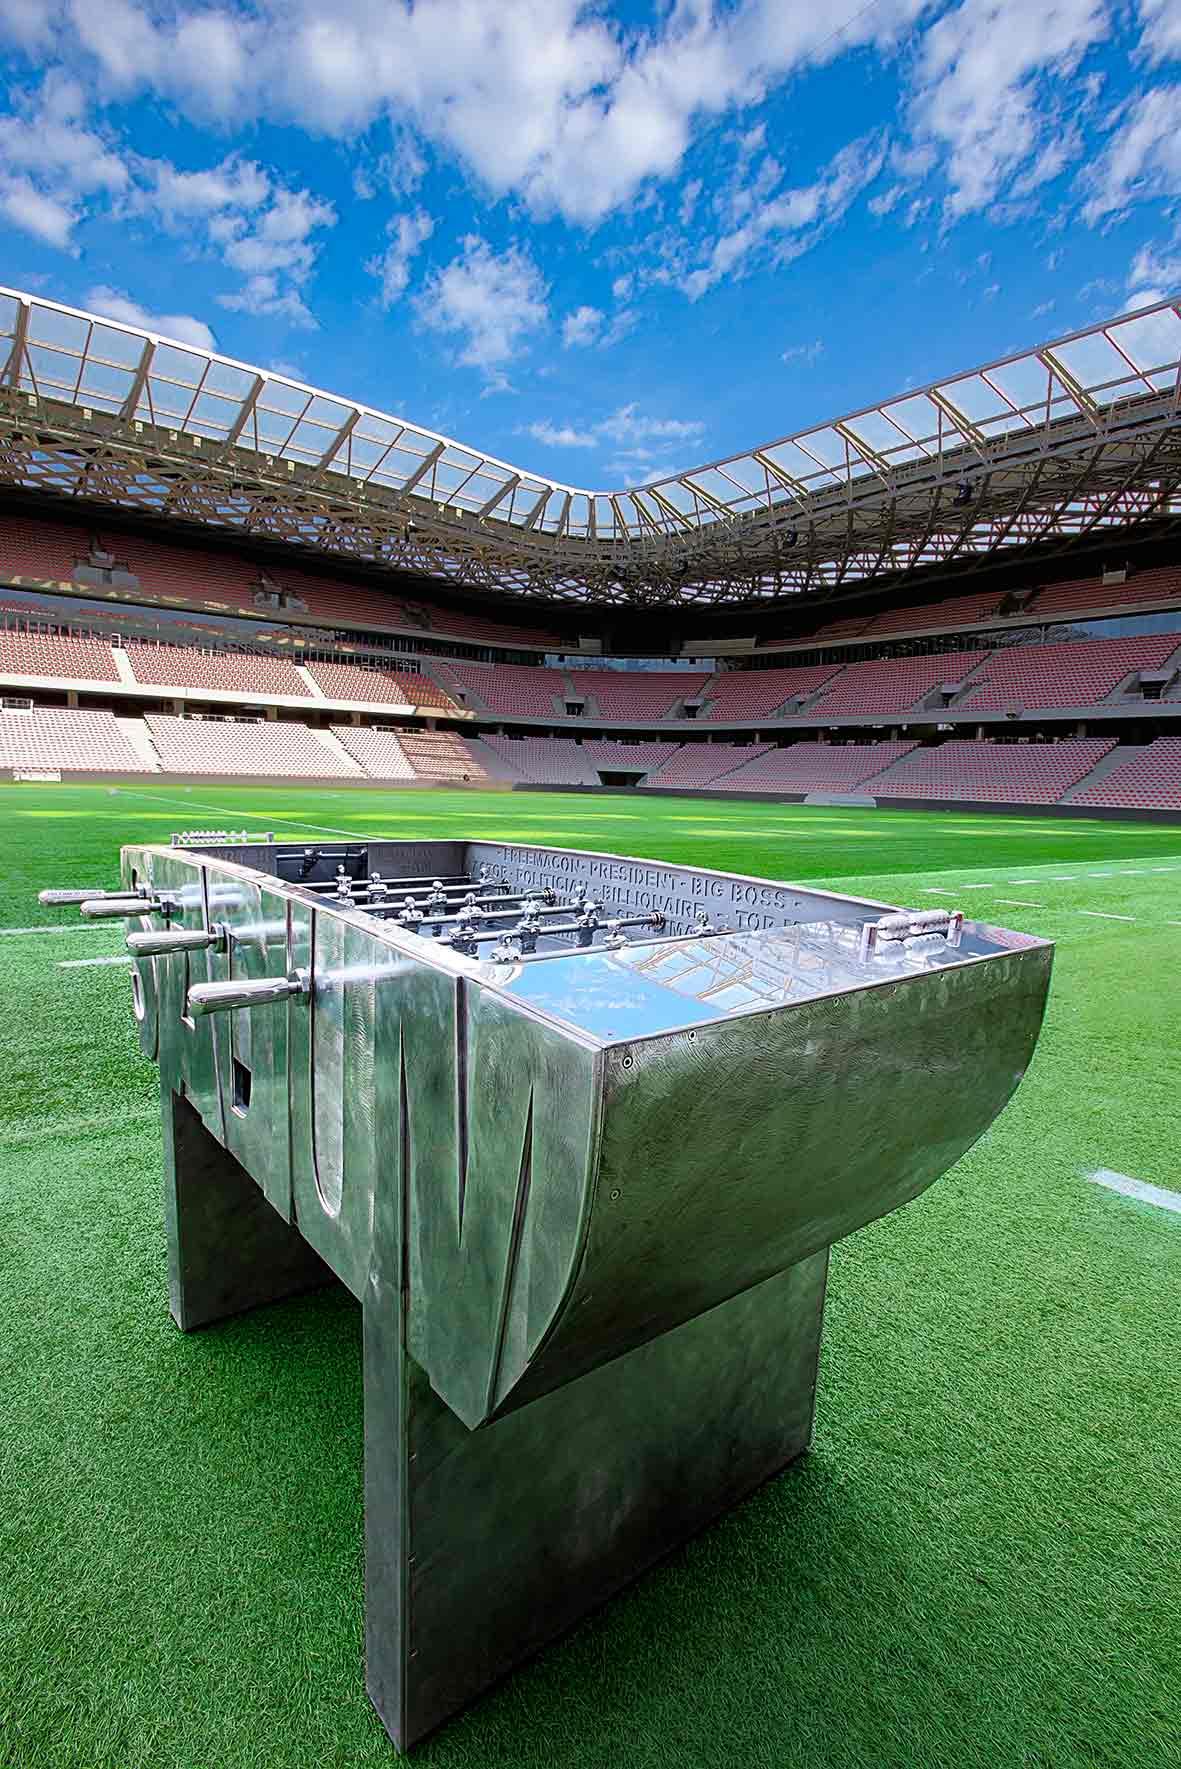 cipre_artiste_sculpteur_2_nicois_baby_foot_aluminium_stadium_stade_allianz_riviera.jpg